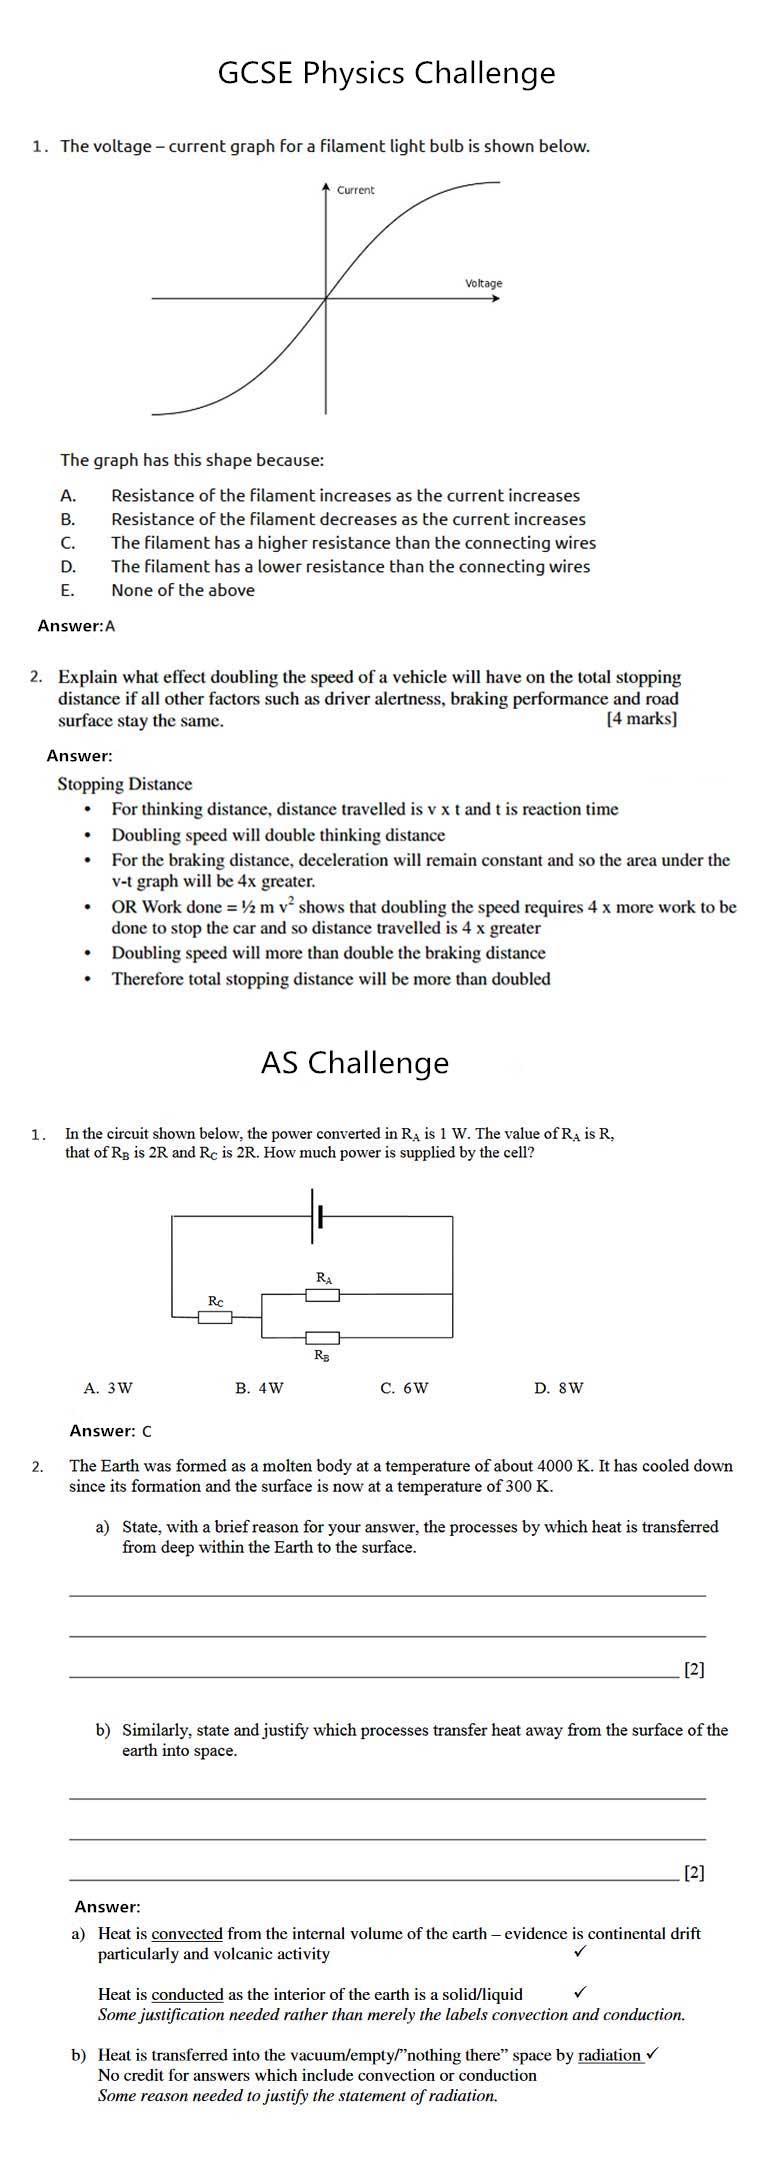 Gcse Physics Challenge As Challenge Asdan China 思德网中国领先